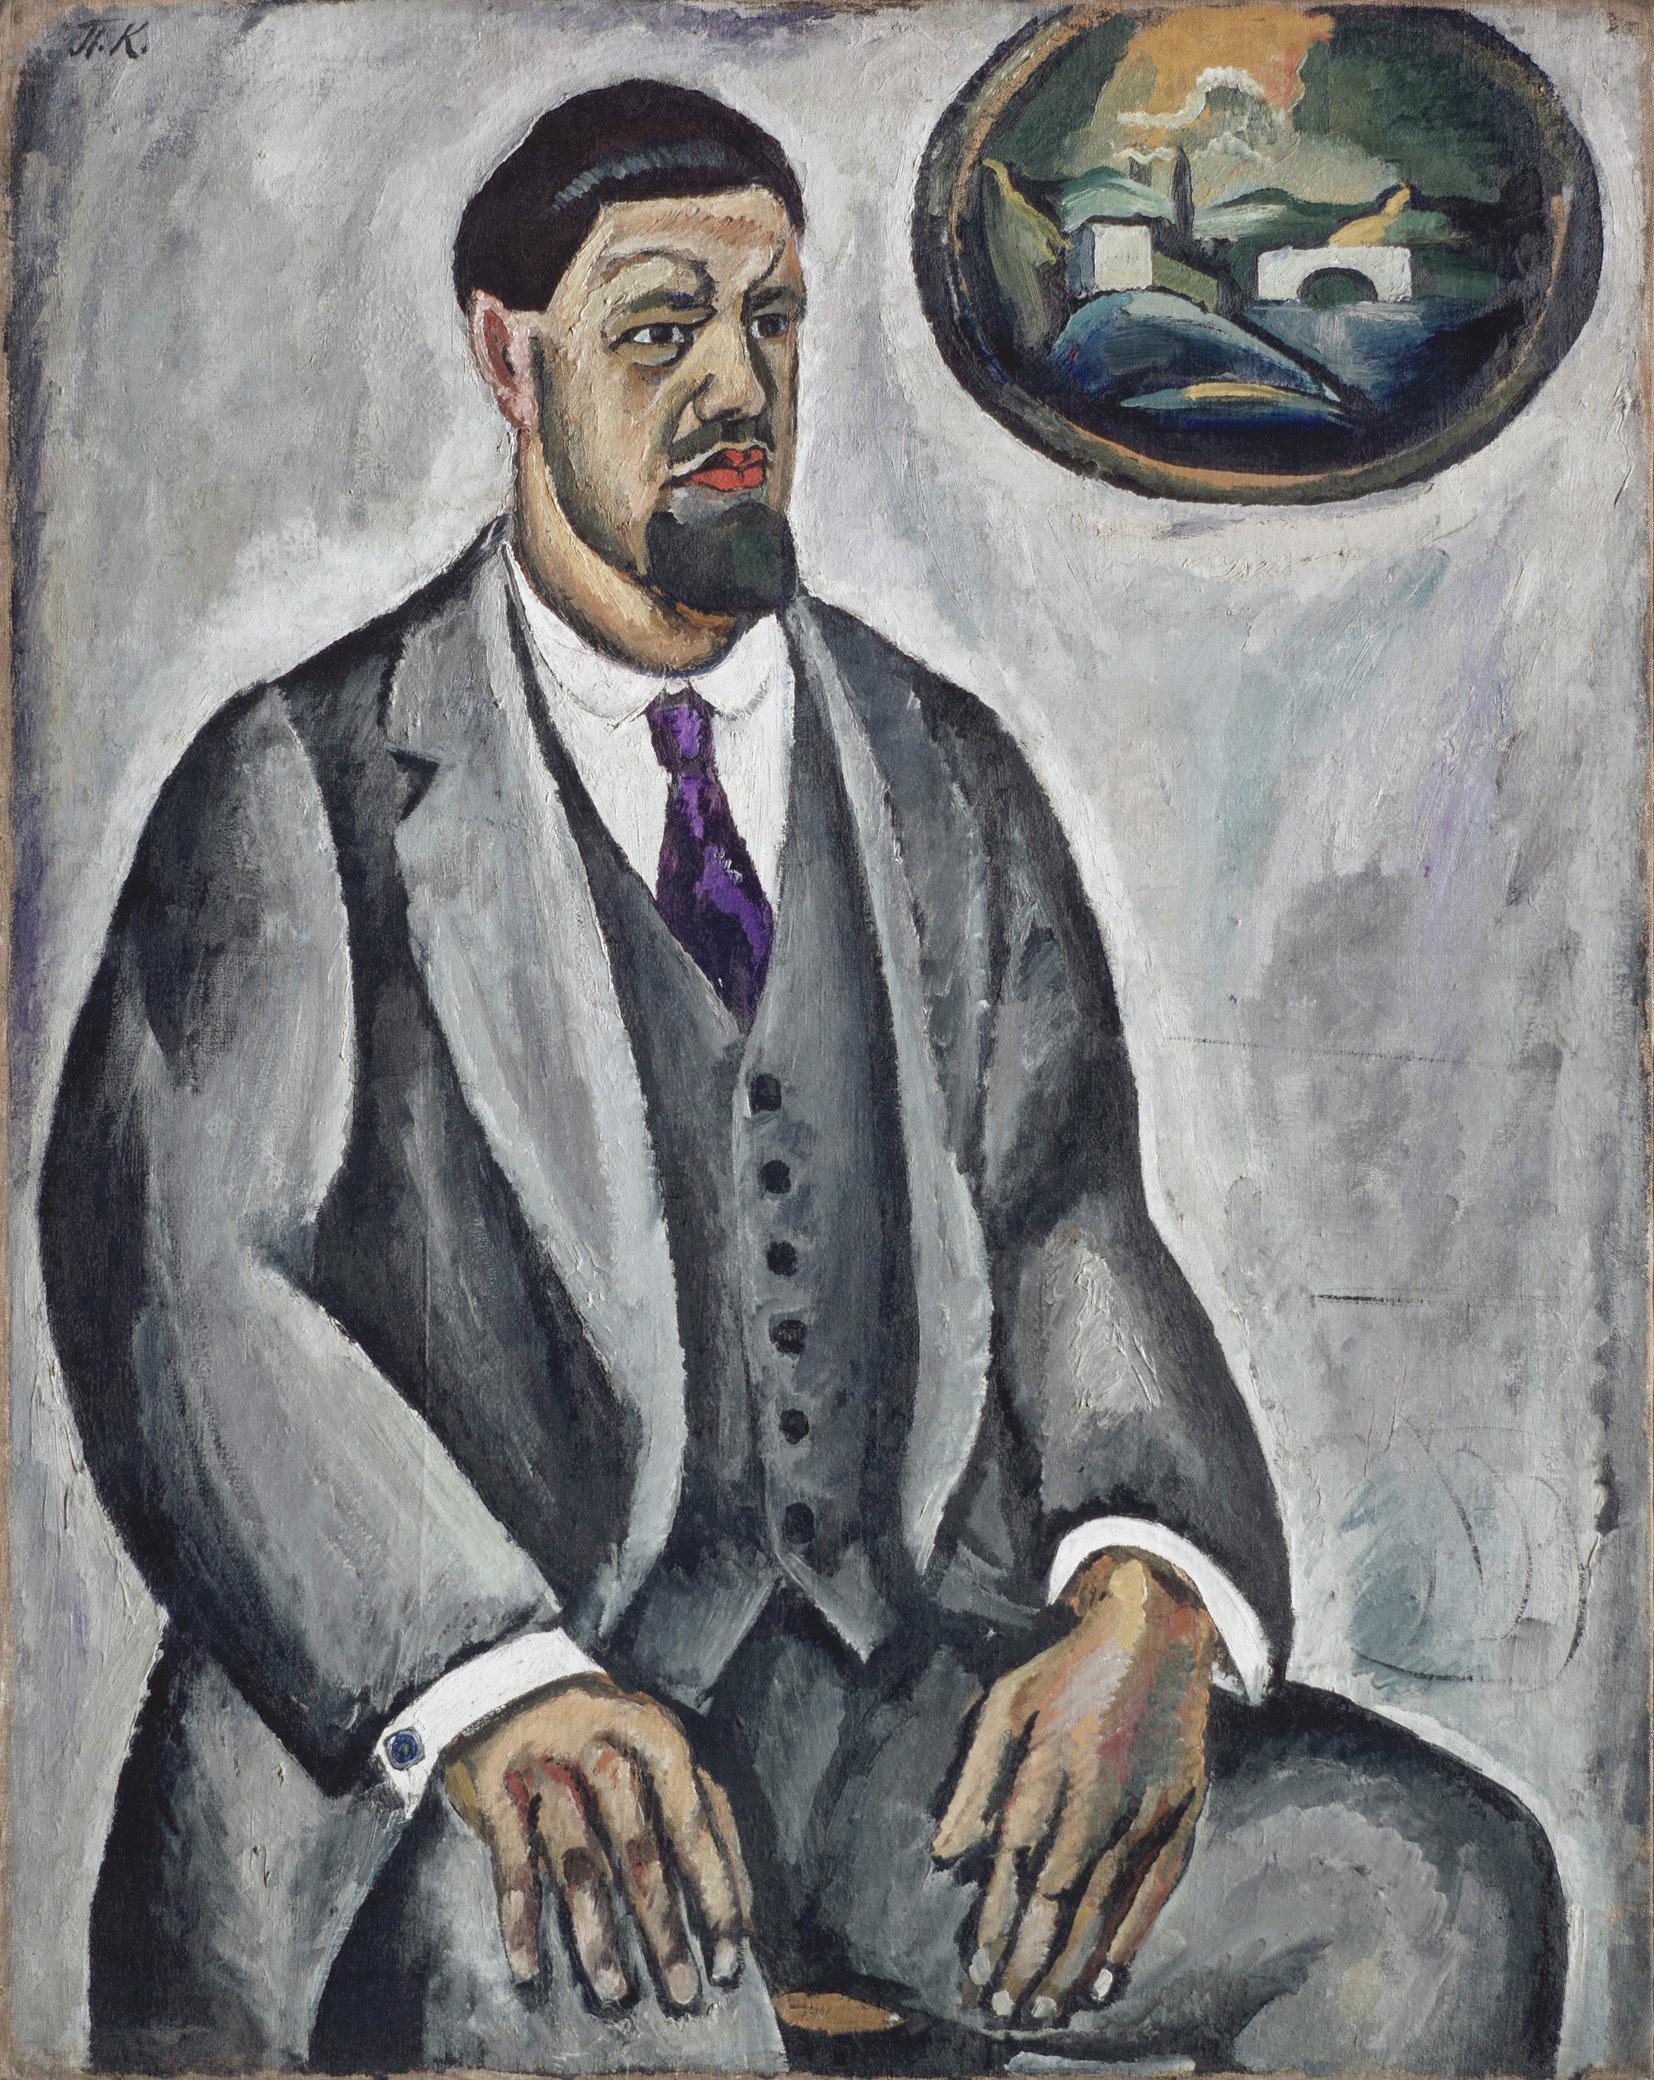 Петр Кончаловский. Автопортрет в сером, 1911